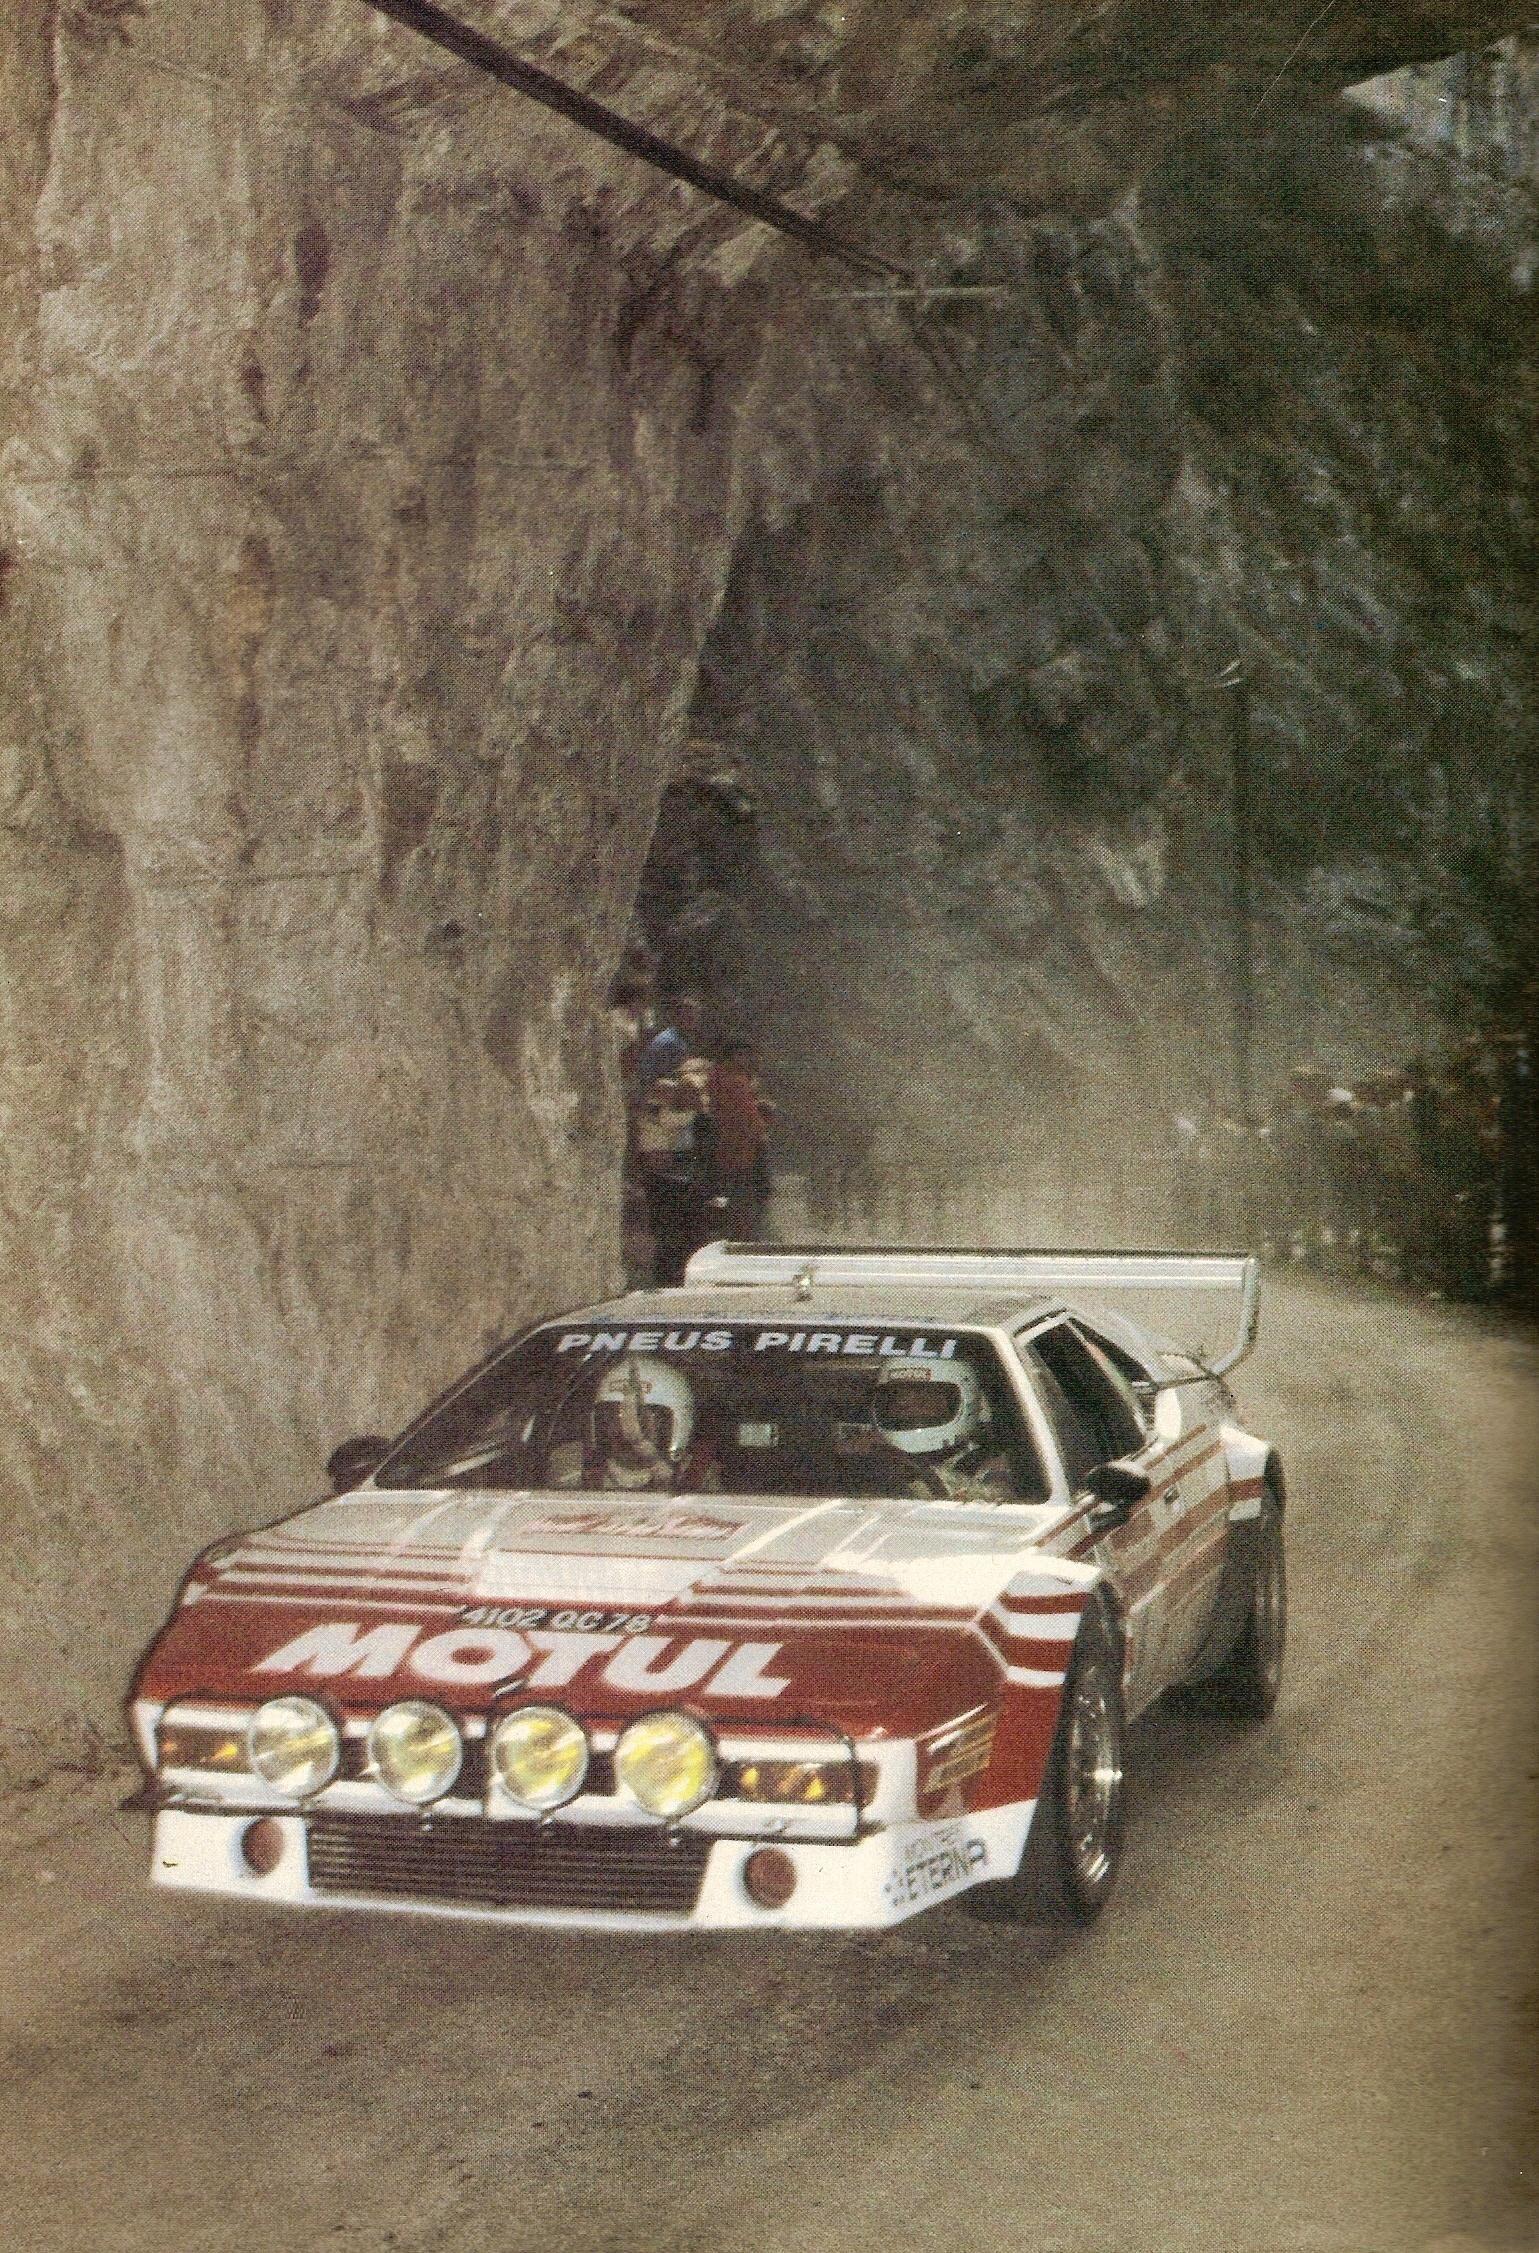 Alpin behra 1983 bmw pinterest for Garage bmw chambery 73